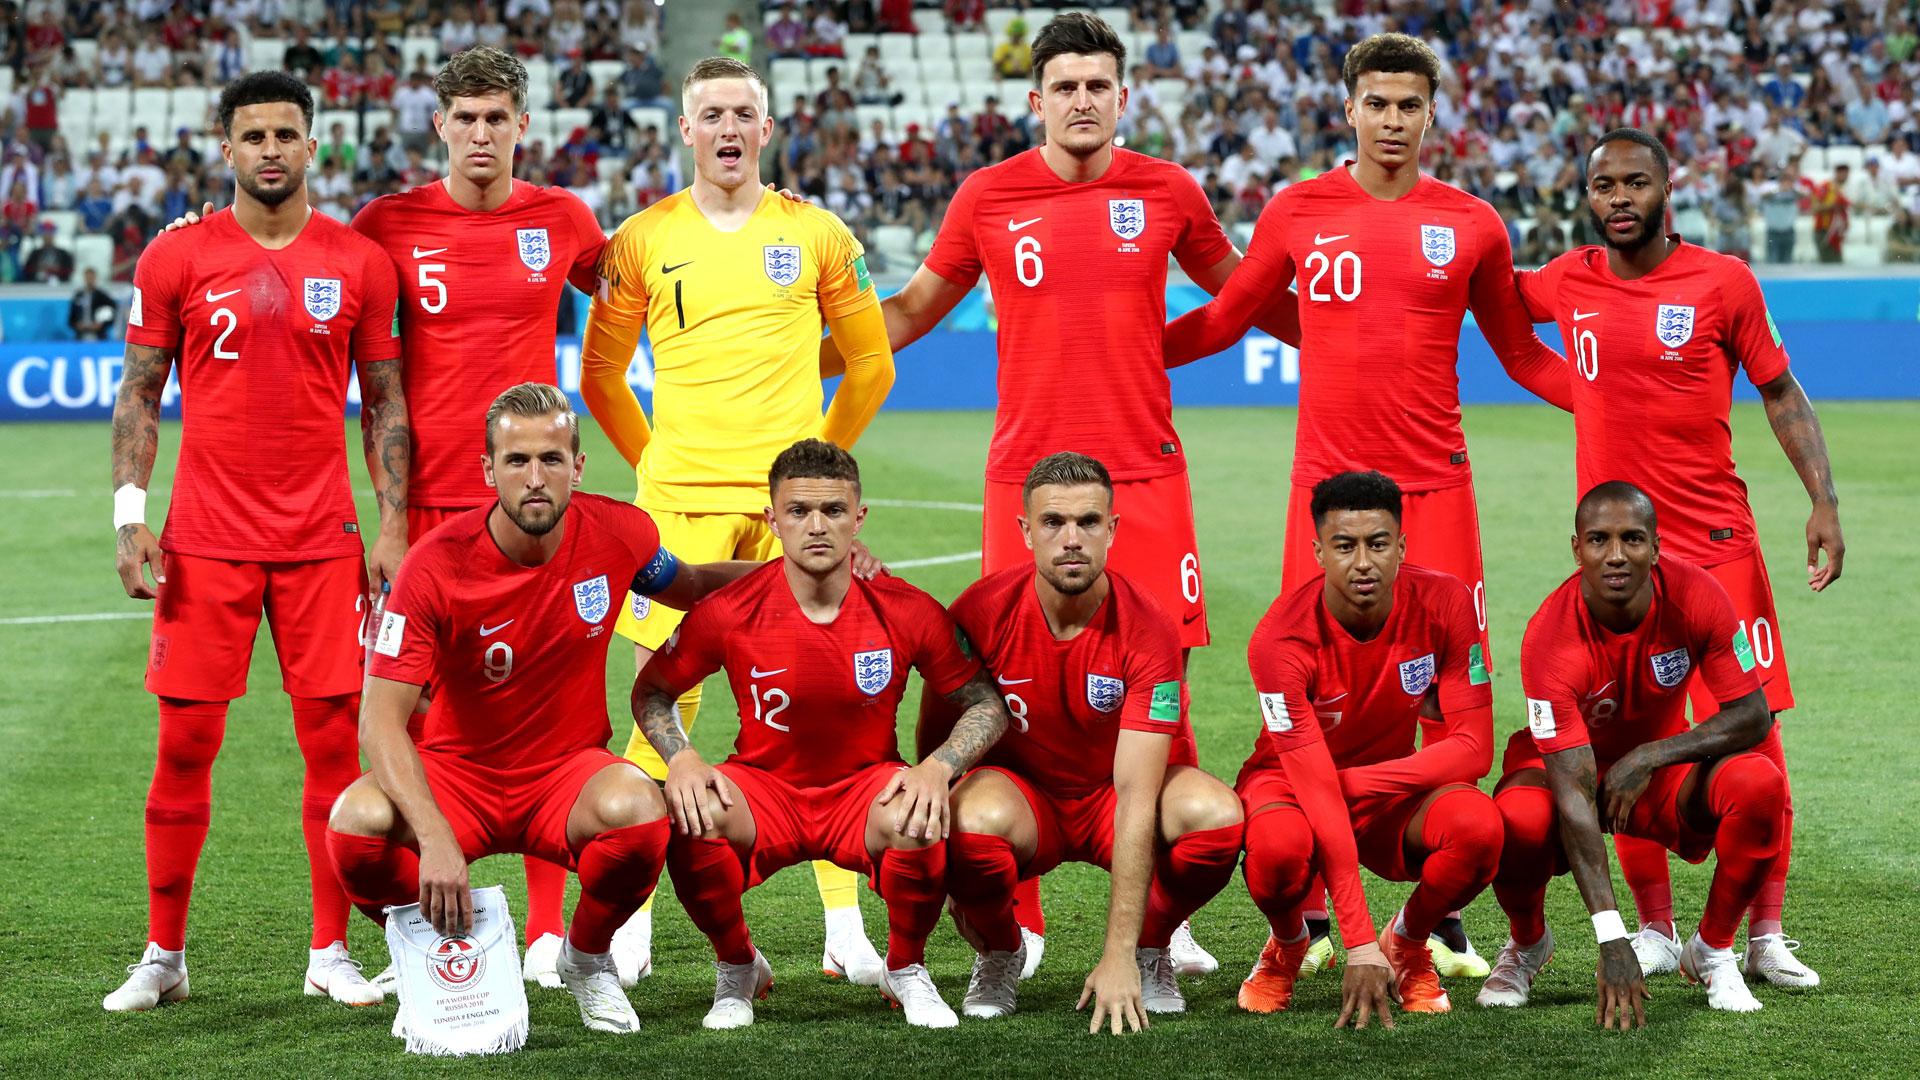 England Bei Der Wm  Kader Spiel Um Platz  Ergebnisse Highlights Goal Com